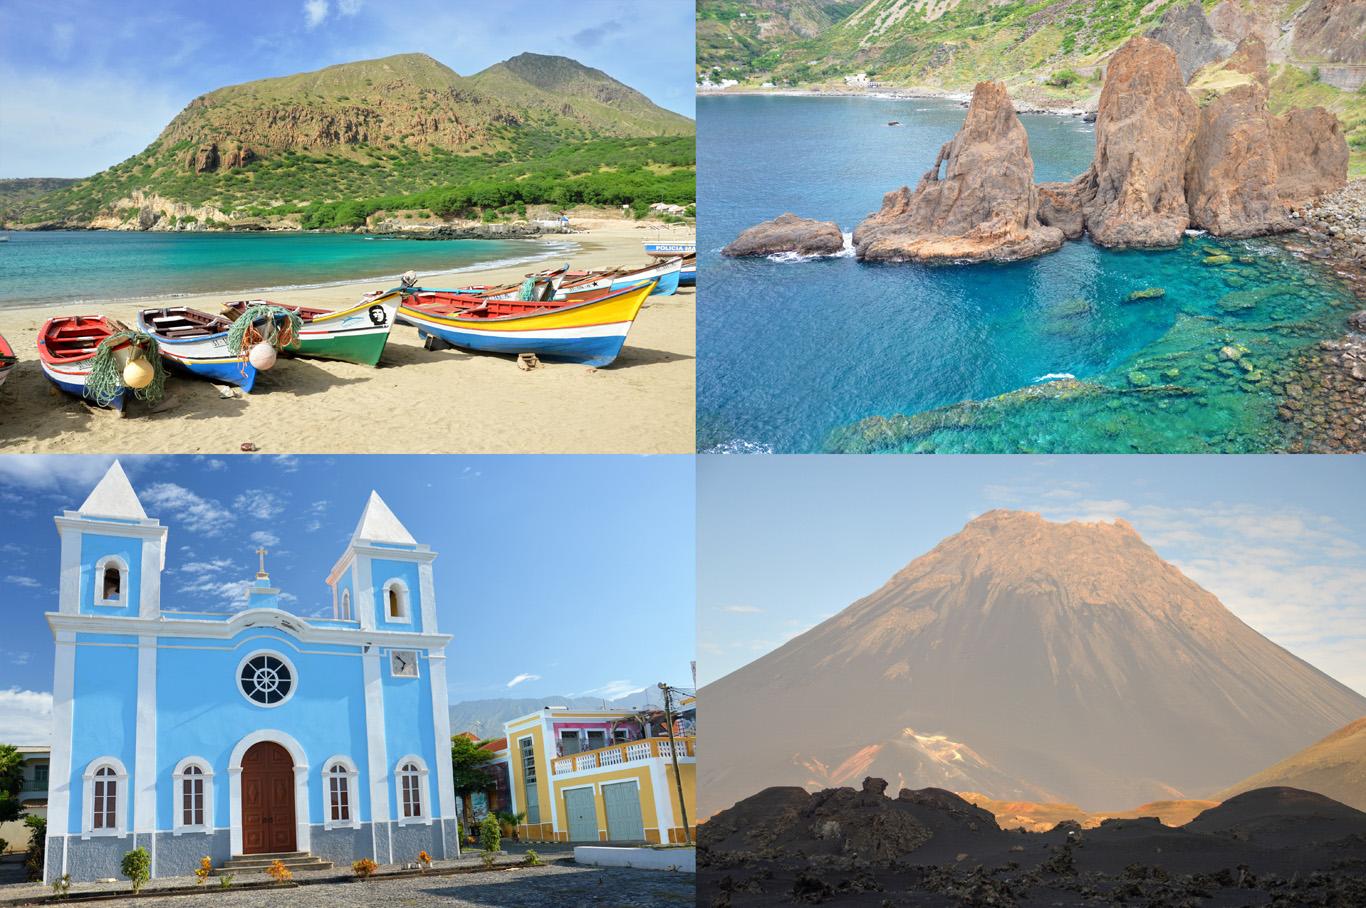 From top left: Tarrafal Beach in Santiago, cliffs at Faja de Agua in Brava, a church in Sao Filipe in Fogo and the volcano Pico do Fogo